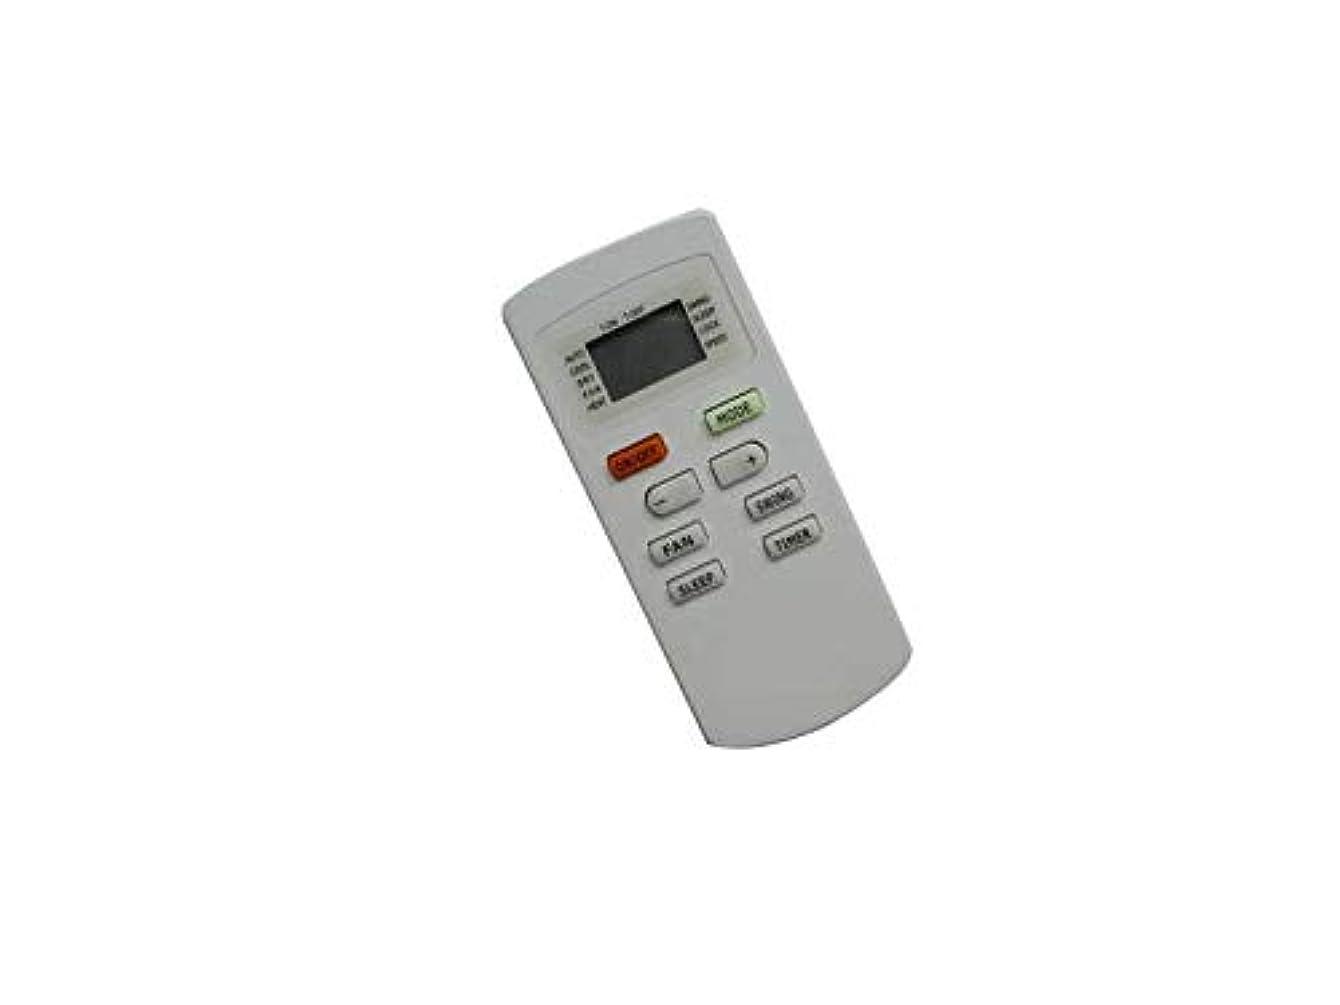 Remote Control For AIR-CON YX1FF ACZEM4H4R12 30510092KM ACZEM4CR18 ACZEM4CR24 ACZEH4CR18 ACZEH4CR24 ACZEM4H4R09 Air Conditioner